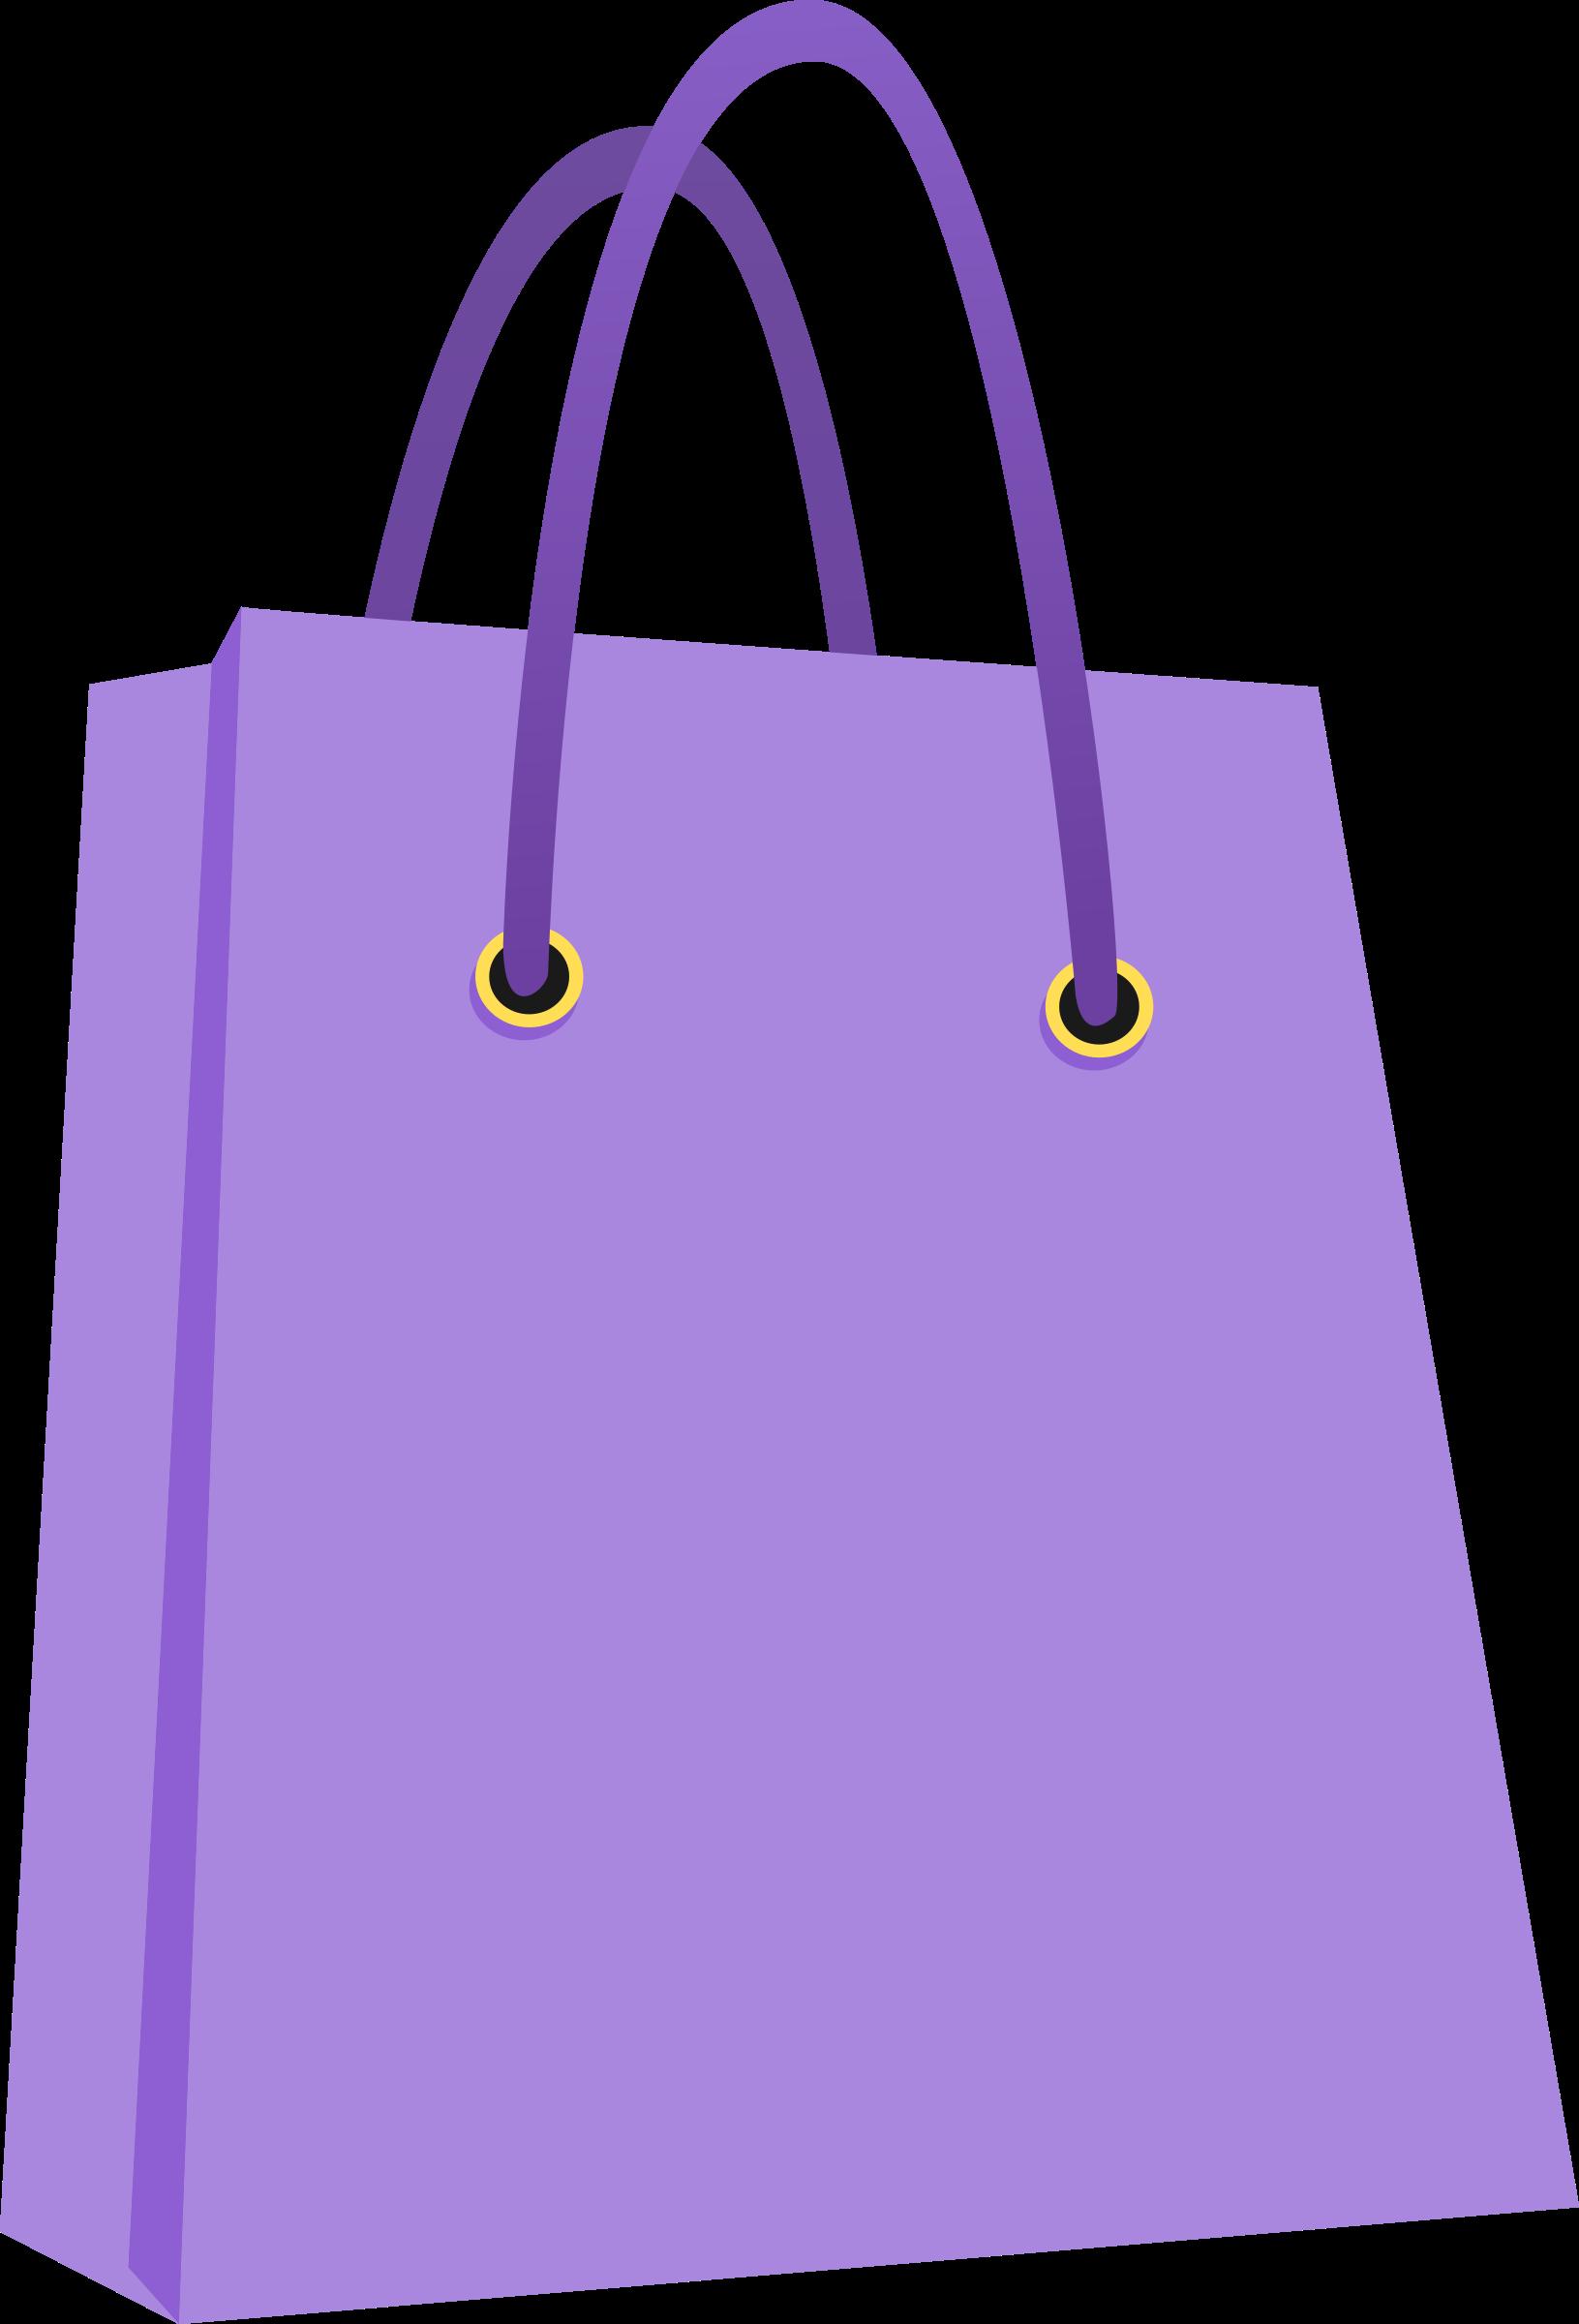 vector royalty free stock Tote bag Shopping Bags